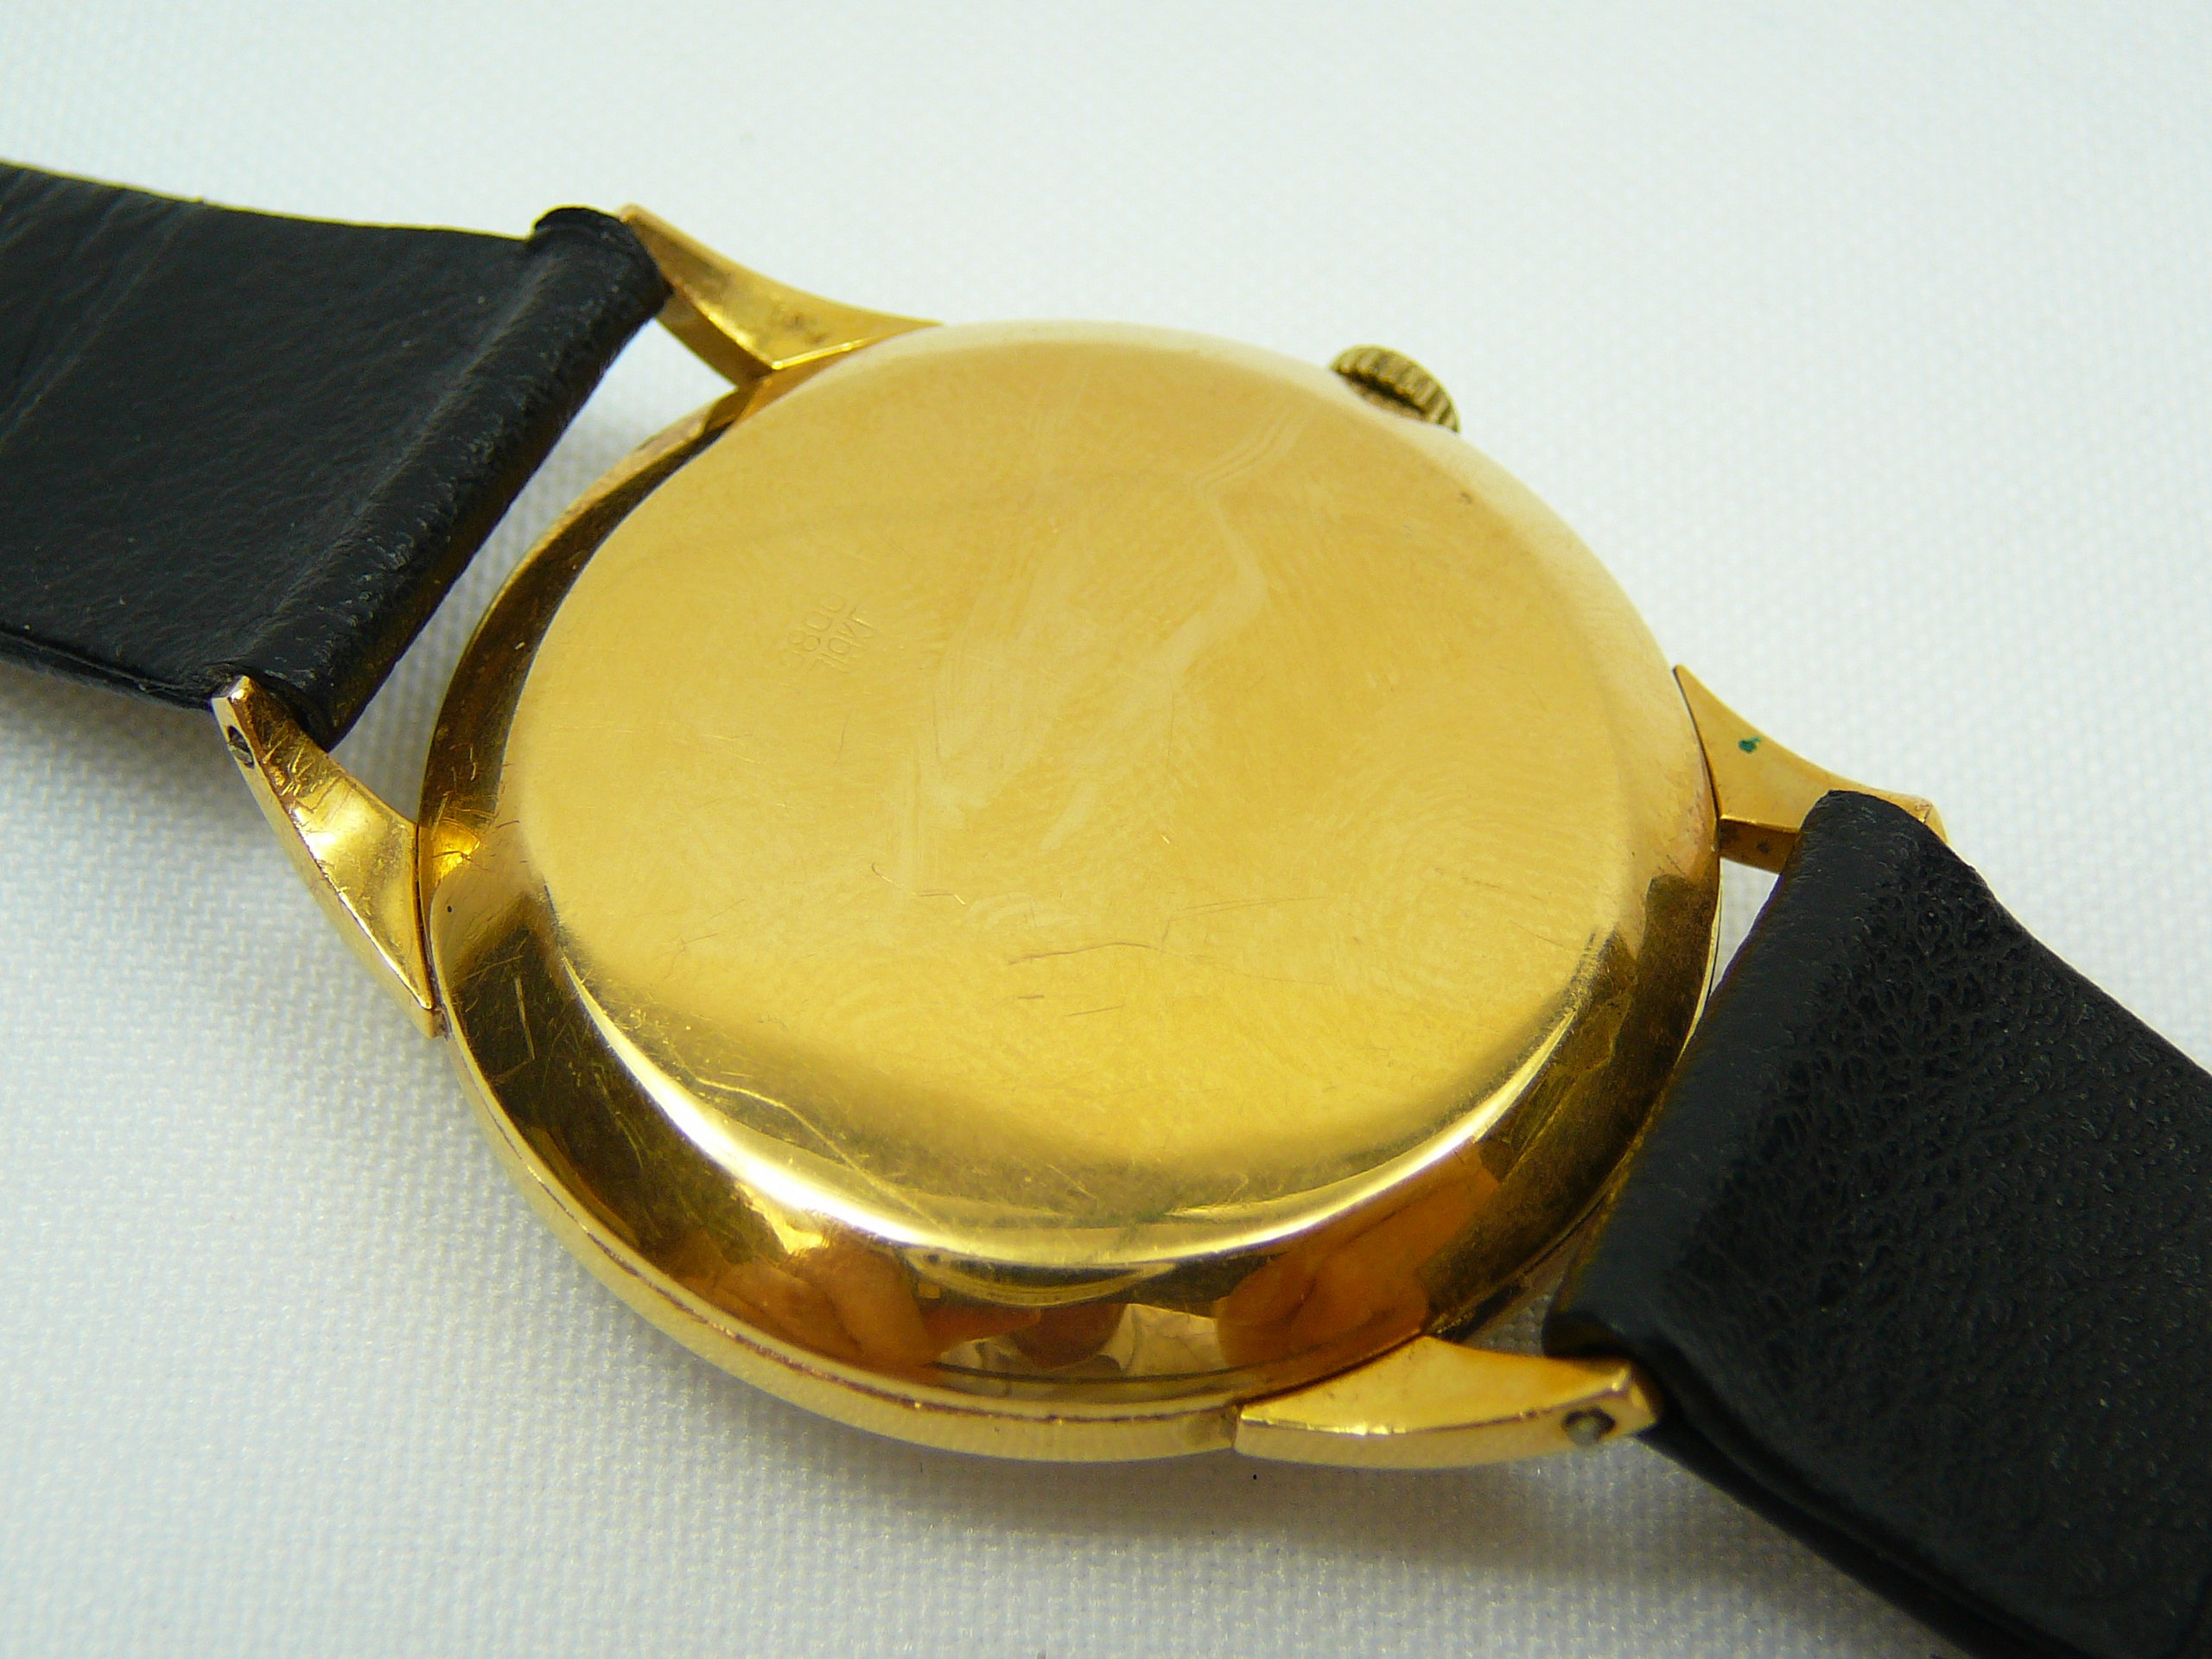 Gents Vintage Gold Longines Wrist Watch - Image 3 of 3